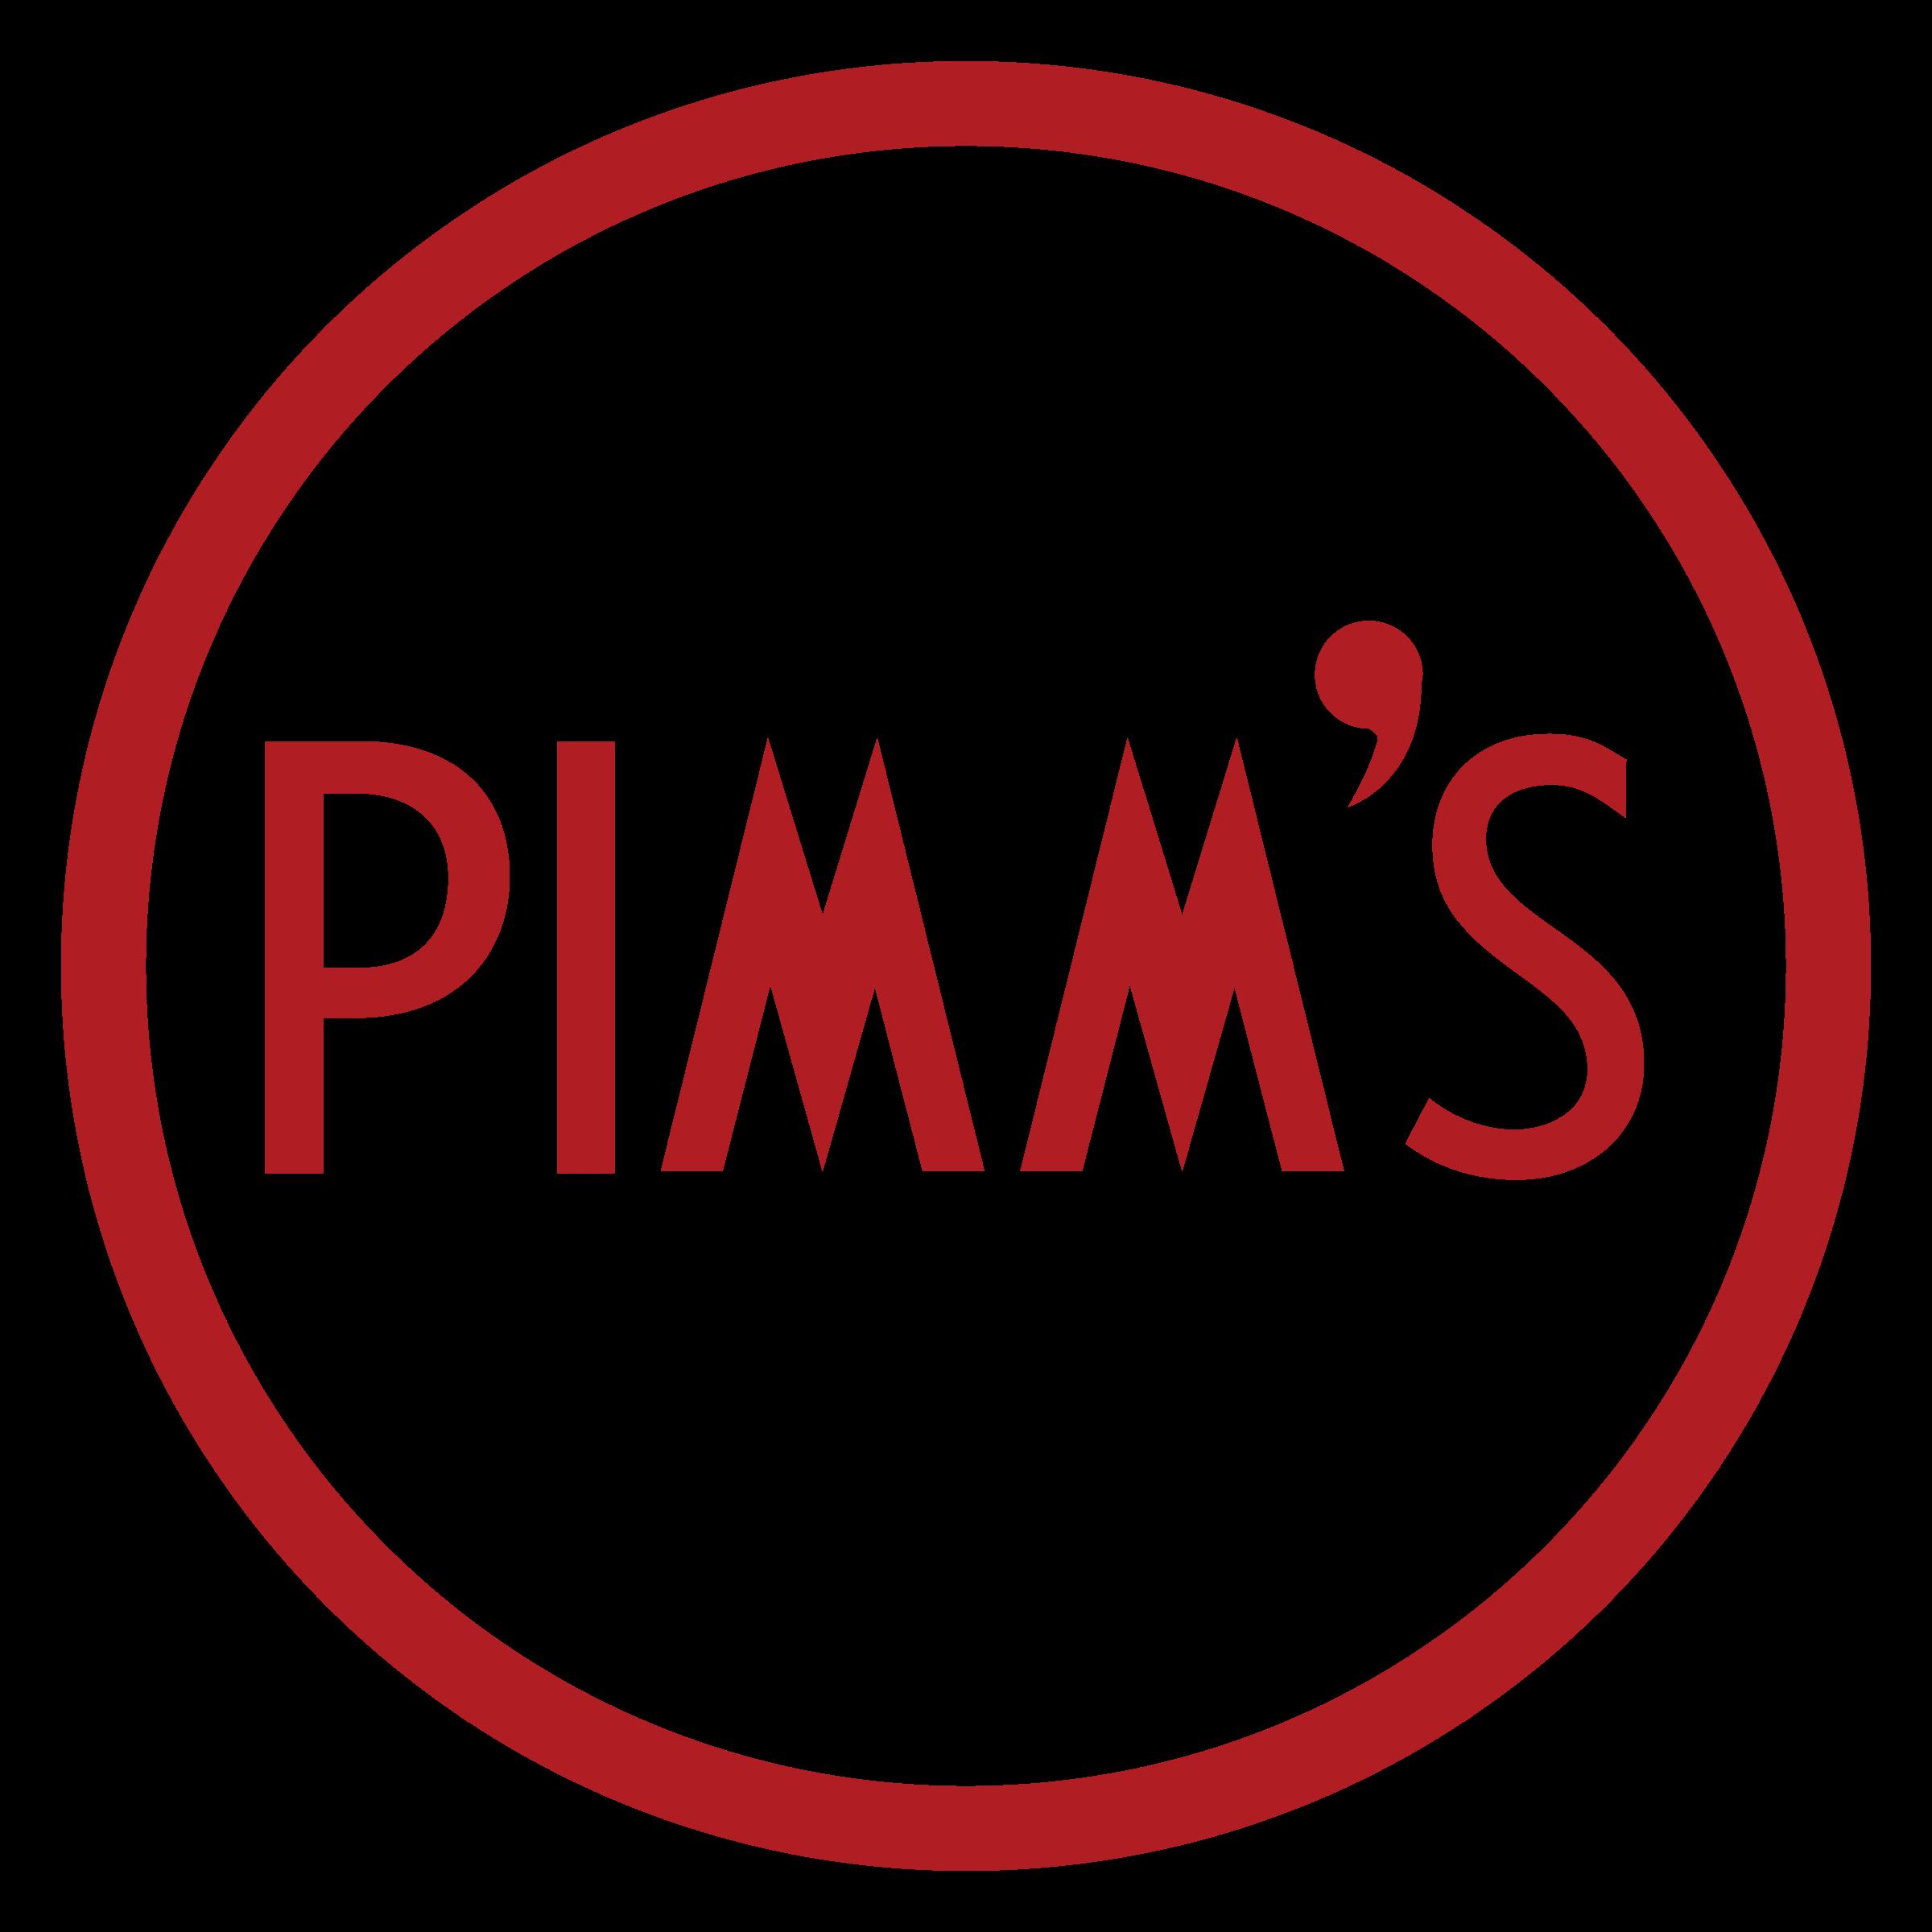 pimms-logo-png-transparent.png